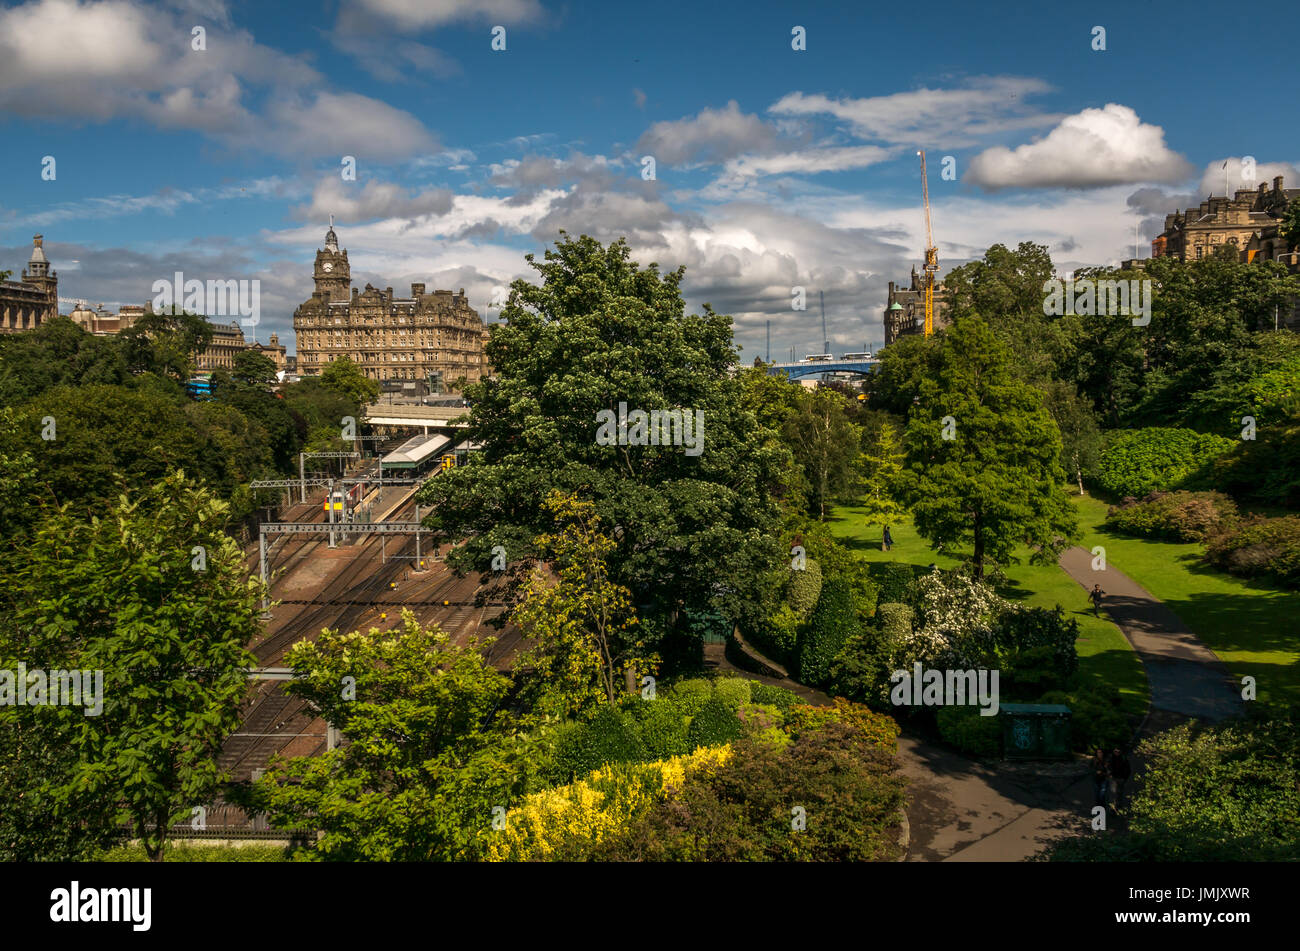 View of railway train lines into Waverley Station, Princes Street Gardens and landmark Rocco Forte Balmoral Hotel, Edinburgh, Scotland, UK - Stock Image